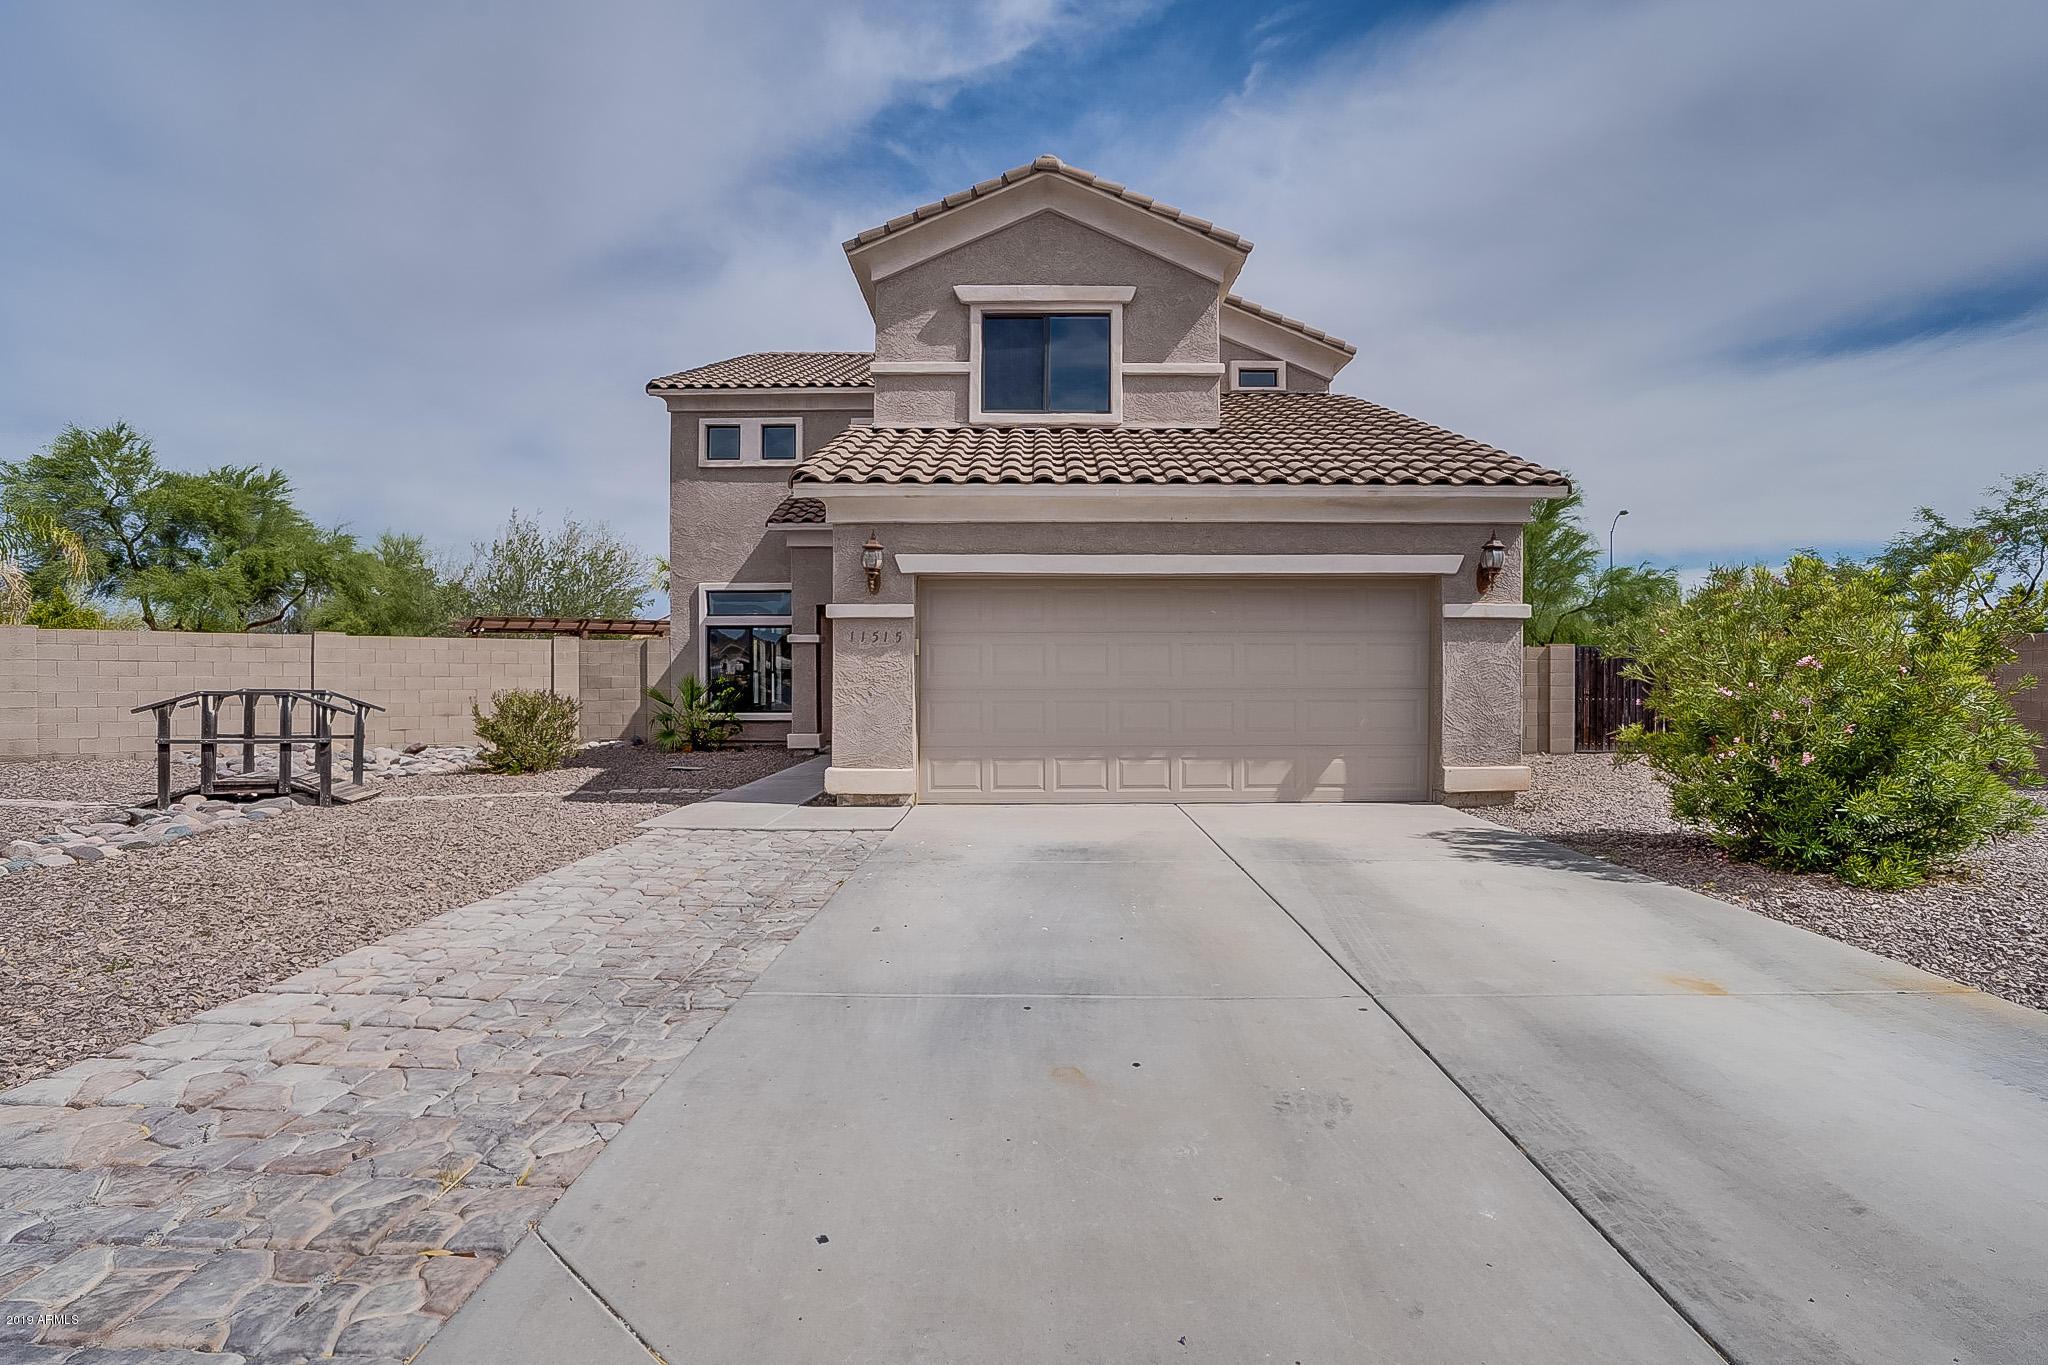 Photo of 11515 E ELLIS Street, Mesa, AZ 85207